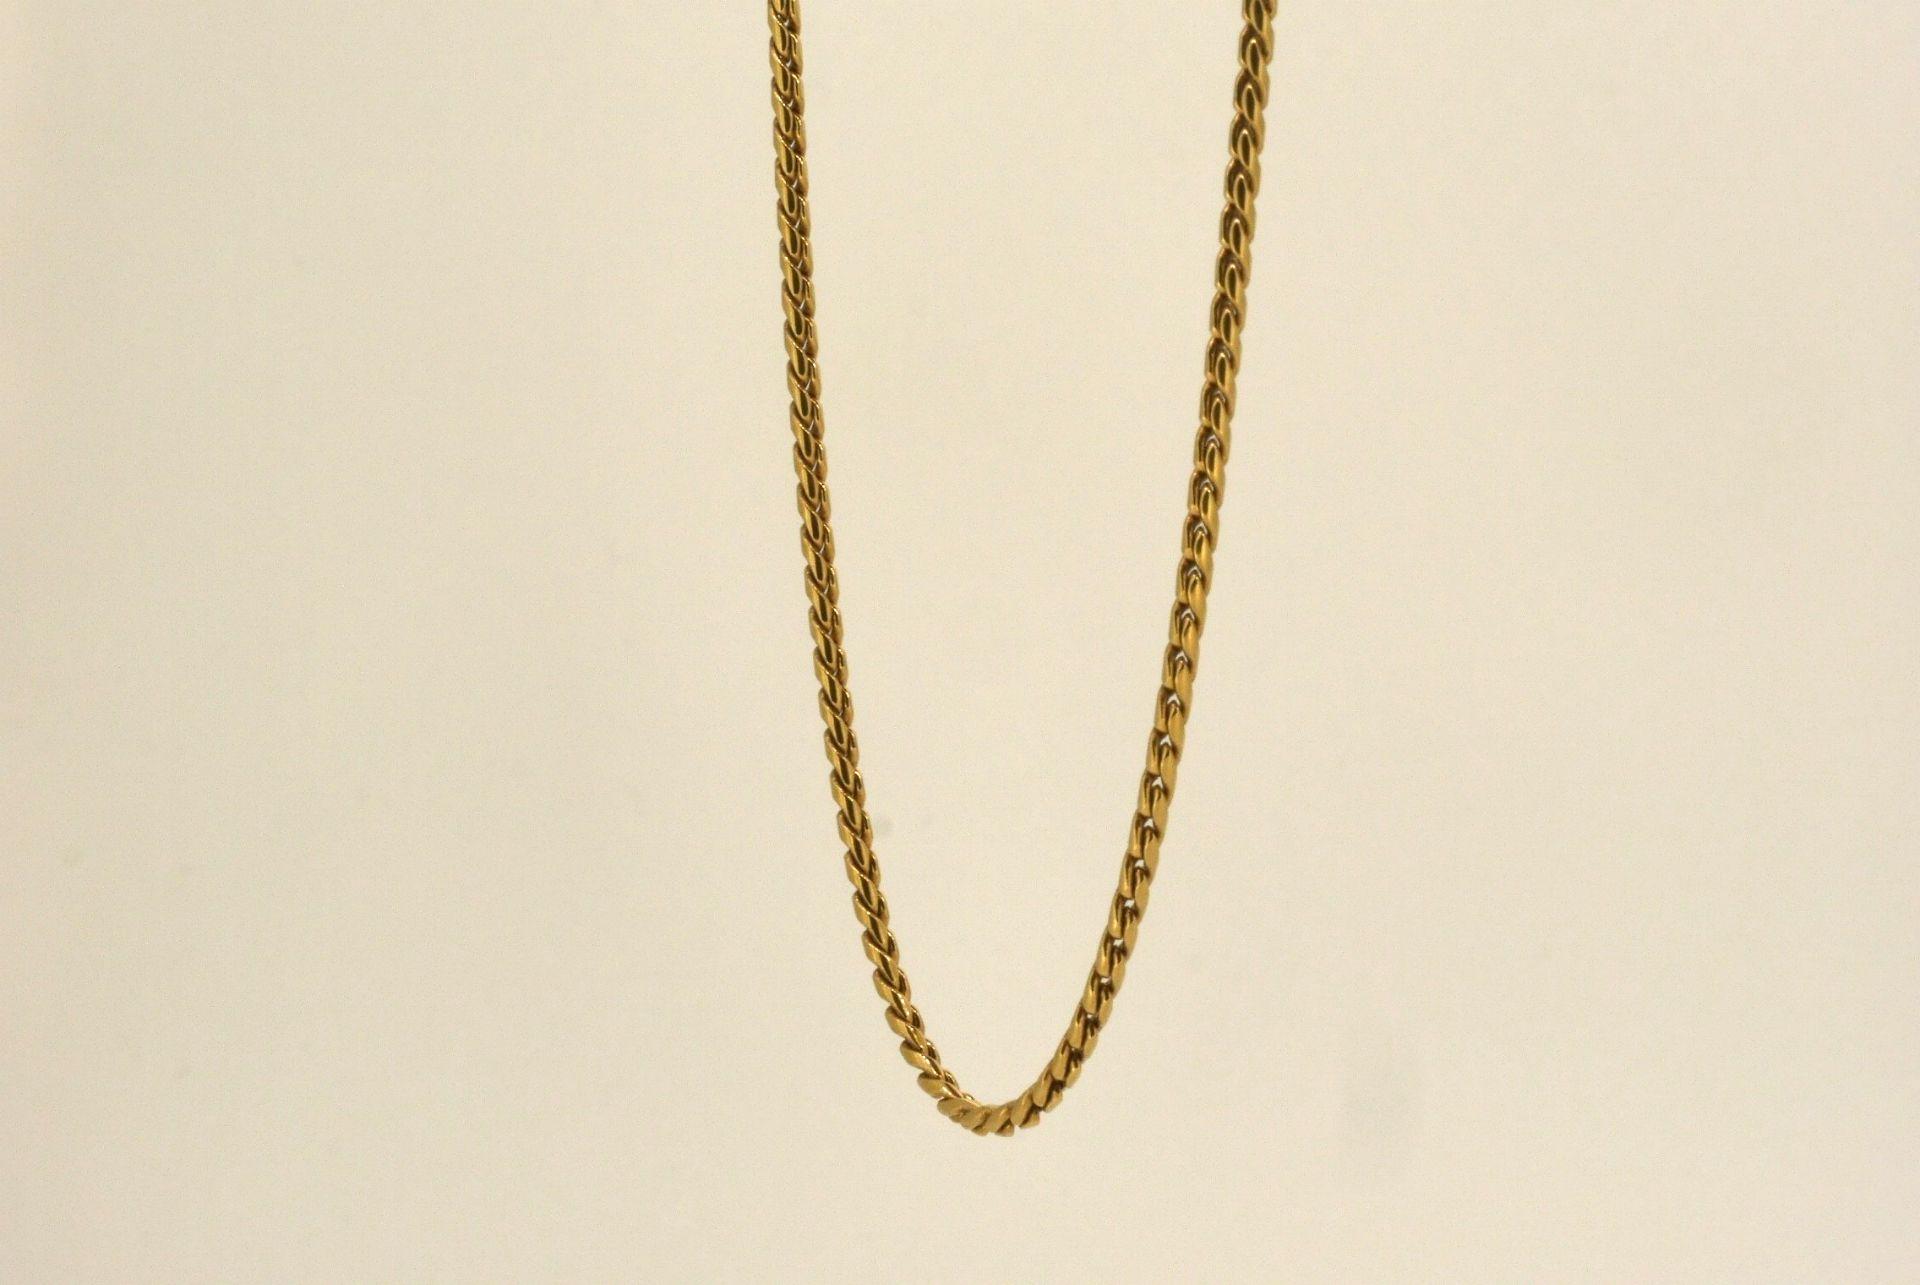 Halskette GG 750, 45 cm, Karabiner defekt, 7,45 Gramm